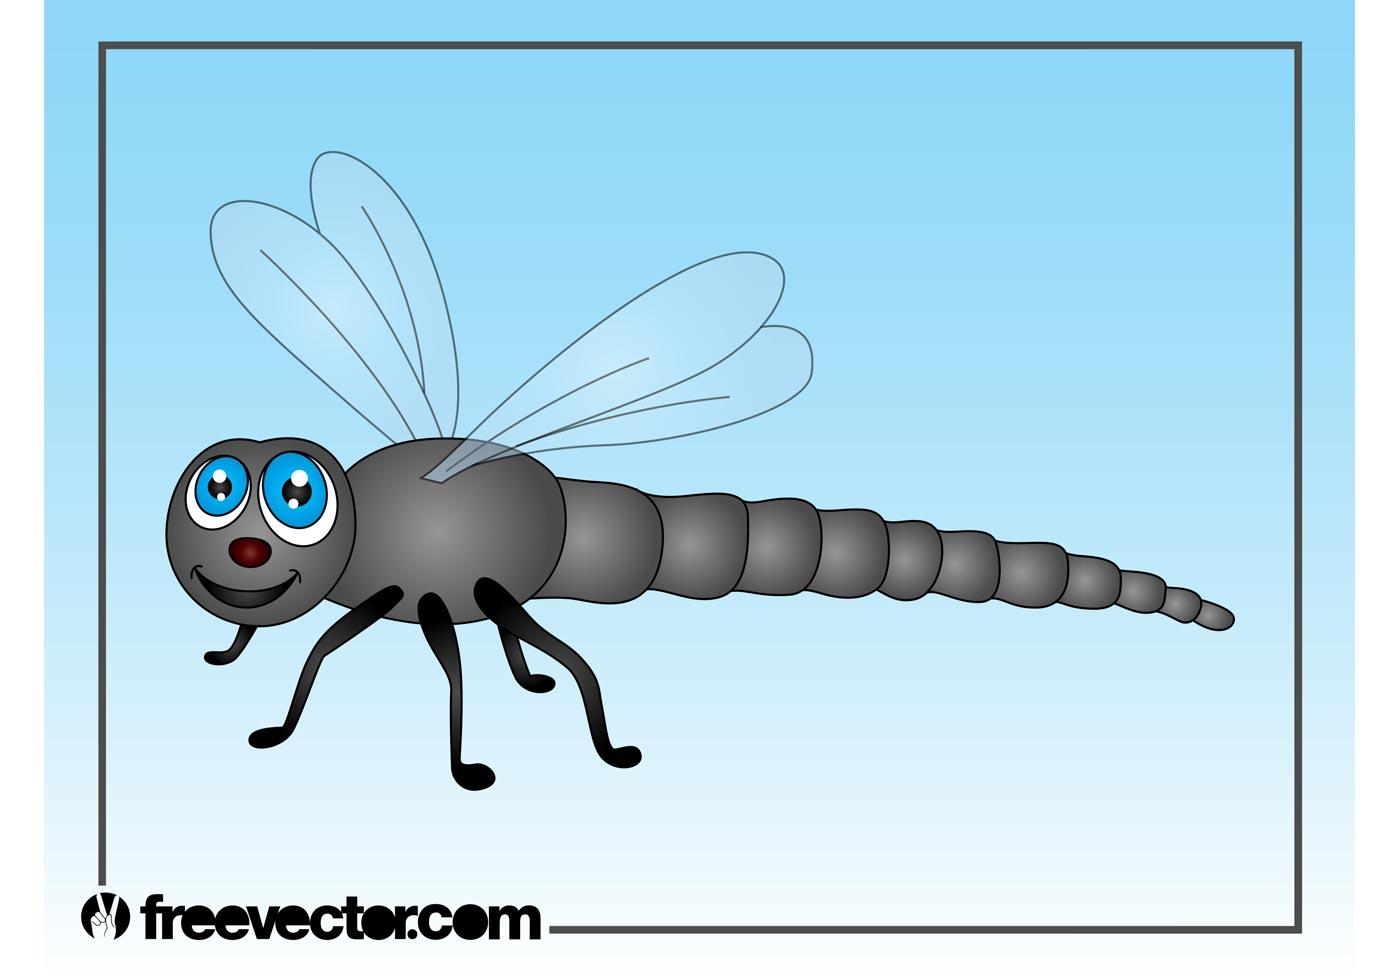 Dragonfly Free Vector Art  4606 Free Downloads  Vecteezy